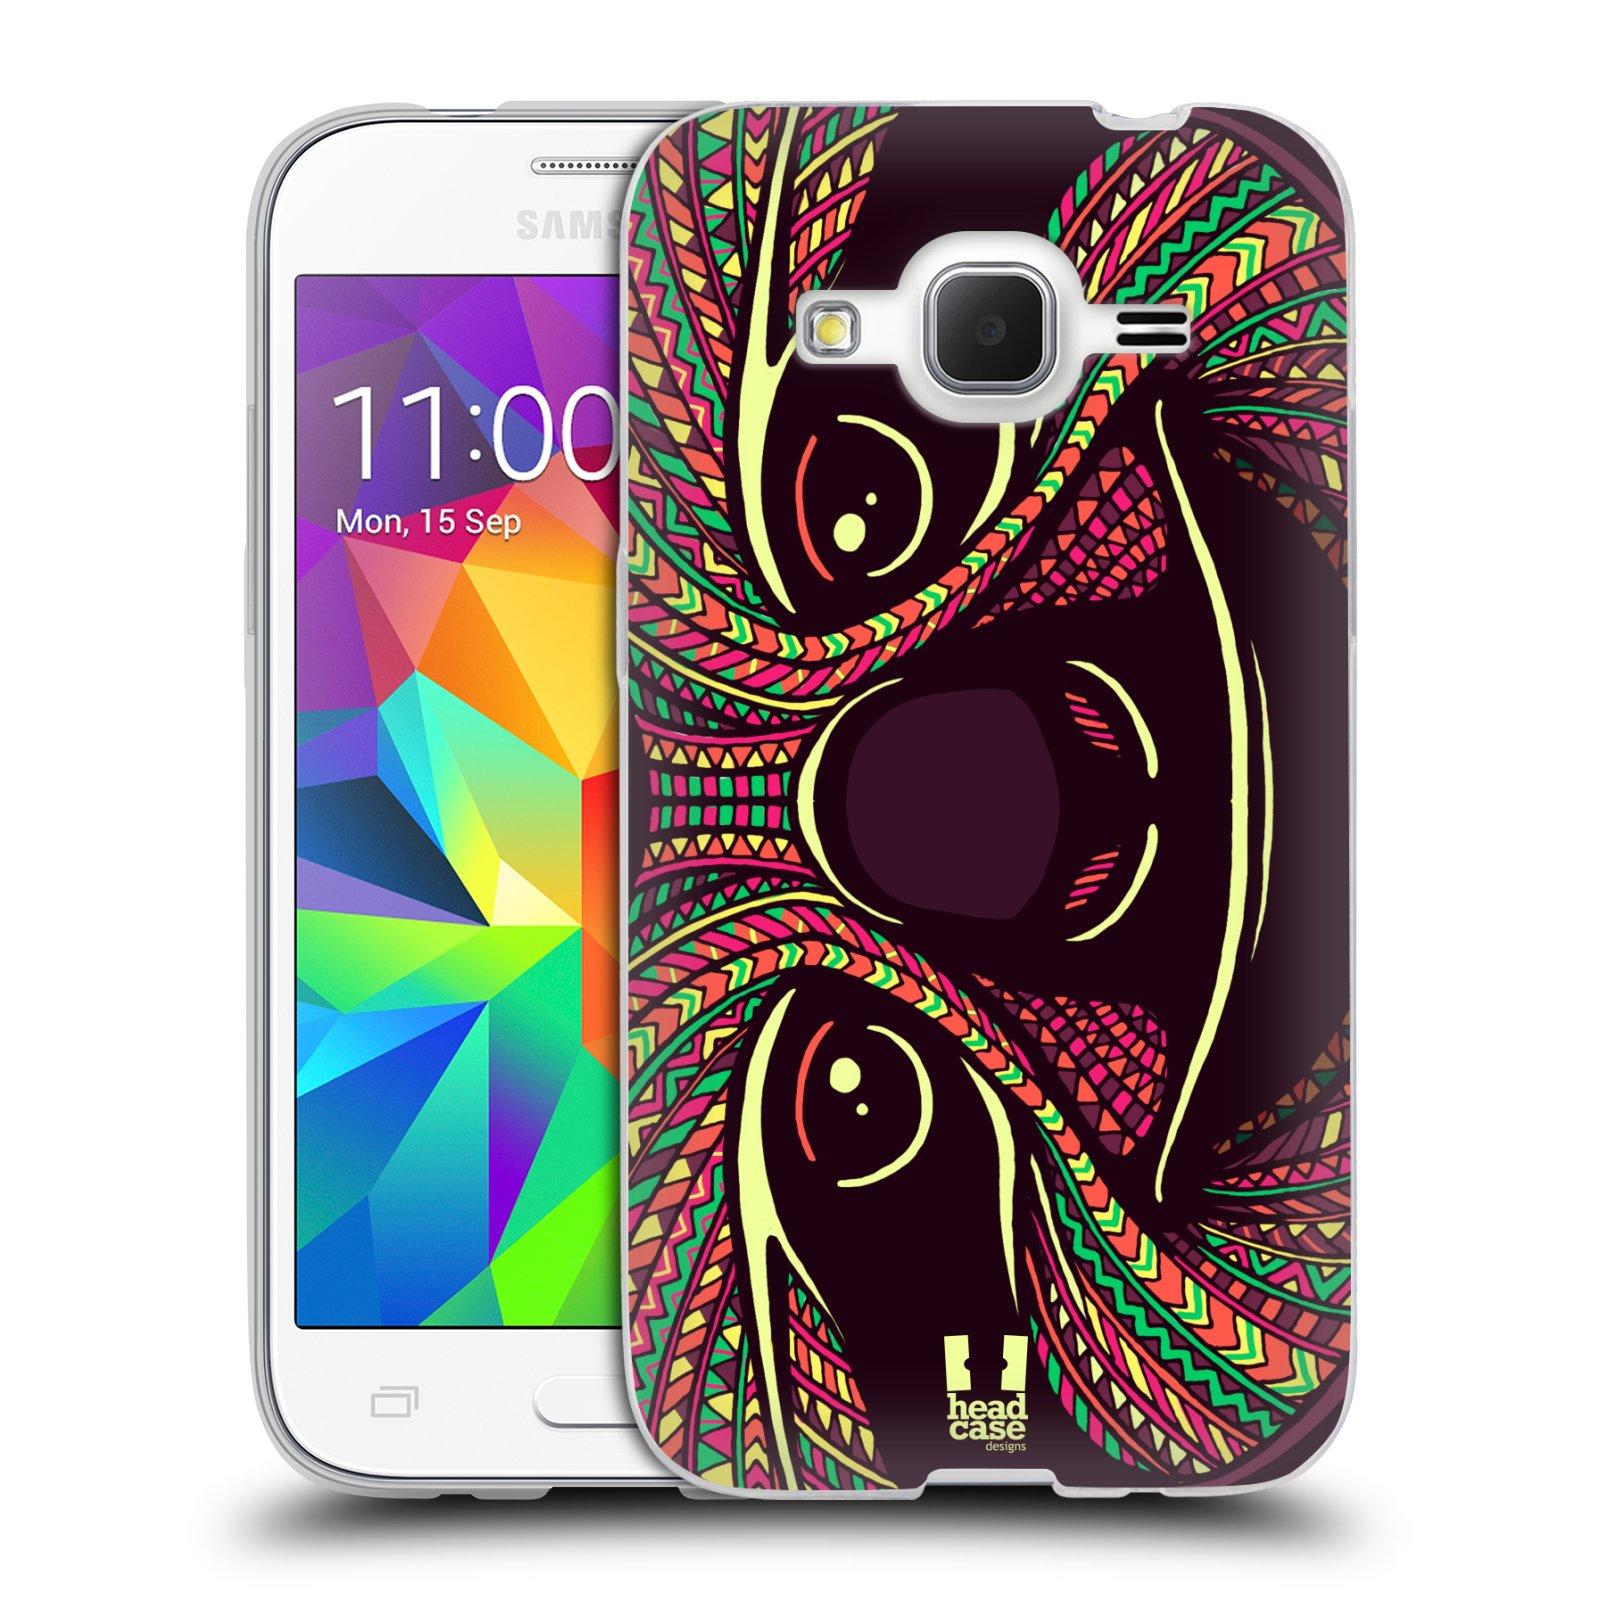 Silikonové pouzdro na mobil Samsung Galaxy Core Prime LTE HEAD CASE AZTEC LENOCHOD (Silikonový kryt či obal na mobilní telefon Samsung Galaxy Core Prime LTE SM-G360)